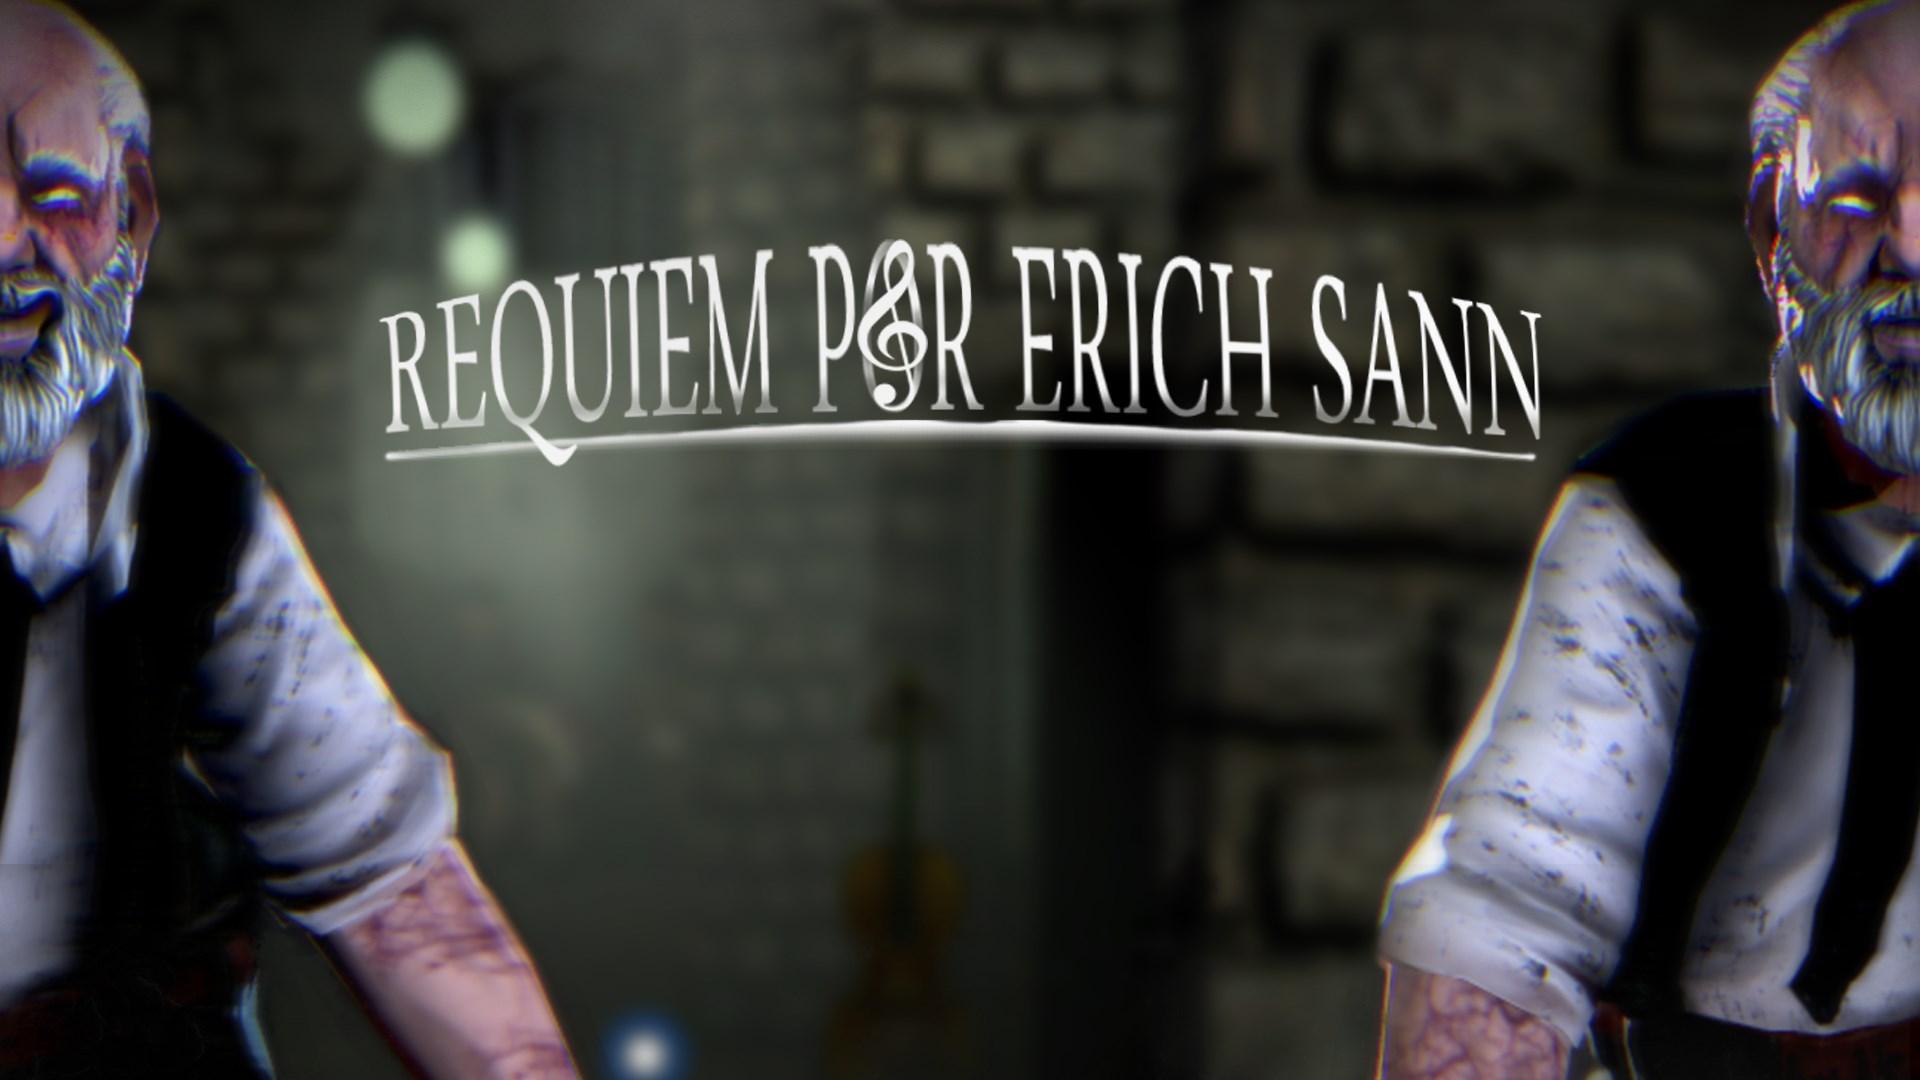 Get Requiem for Erich Sann - Microsoft Store